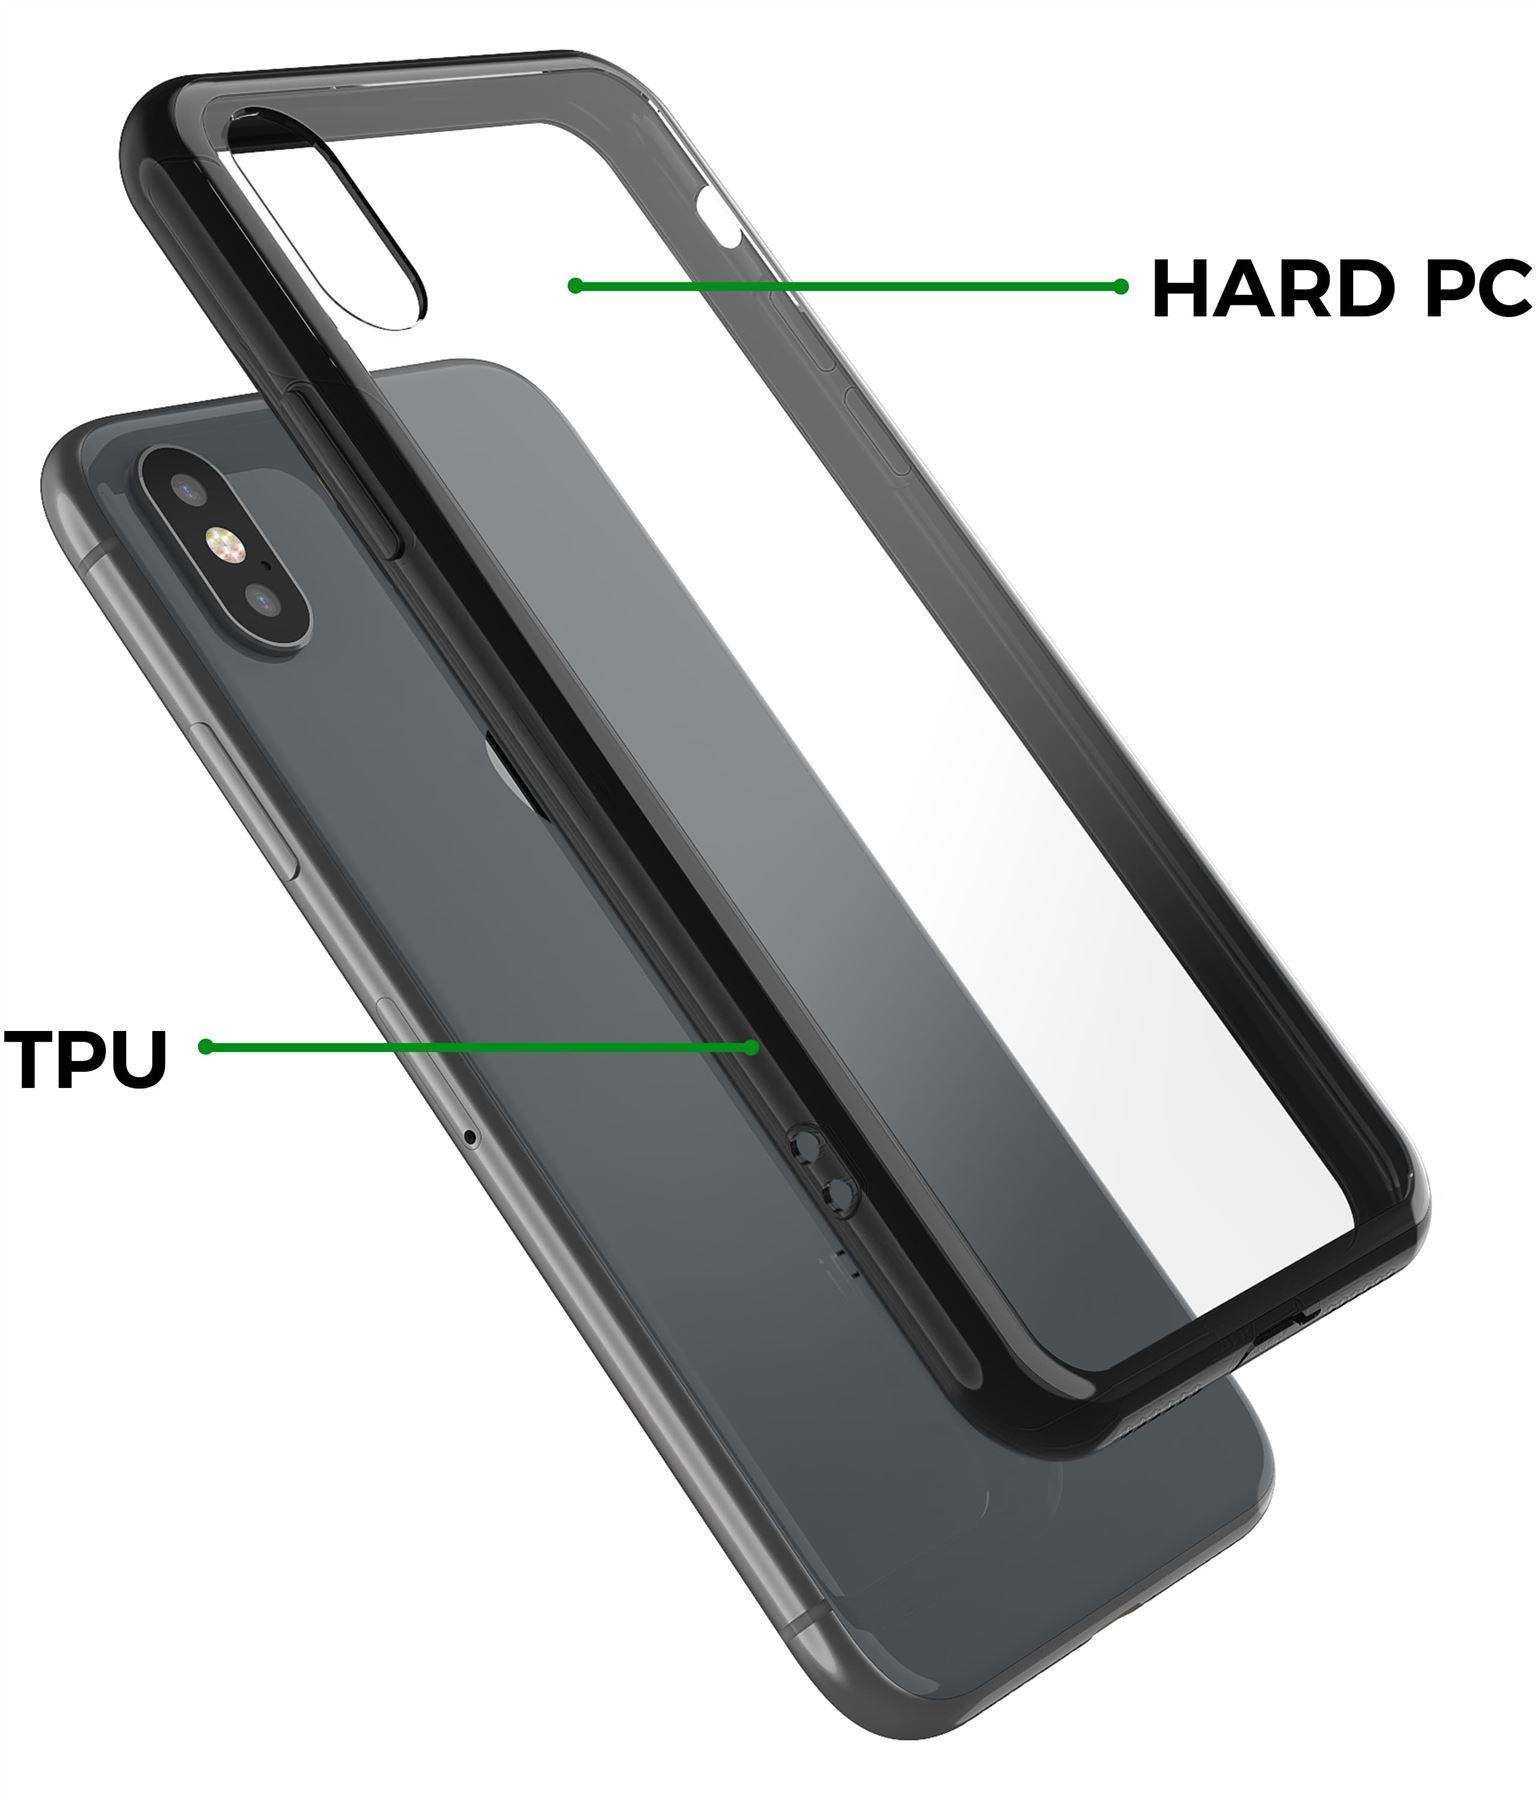 thumbnail 8 - For Apple iPhone XR Xs Max X 8 7 Plus 6 5 Se Case Cover Clear Transparent CS283